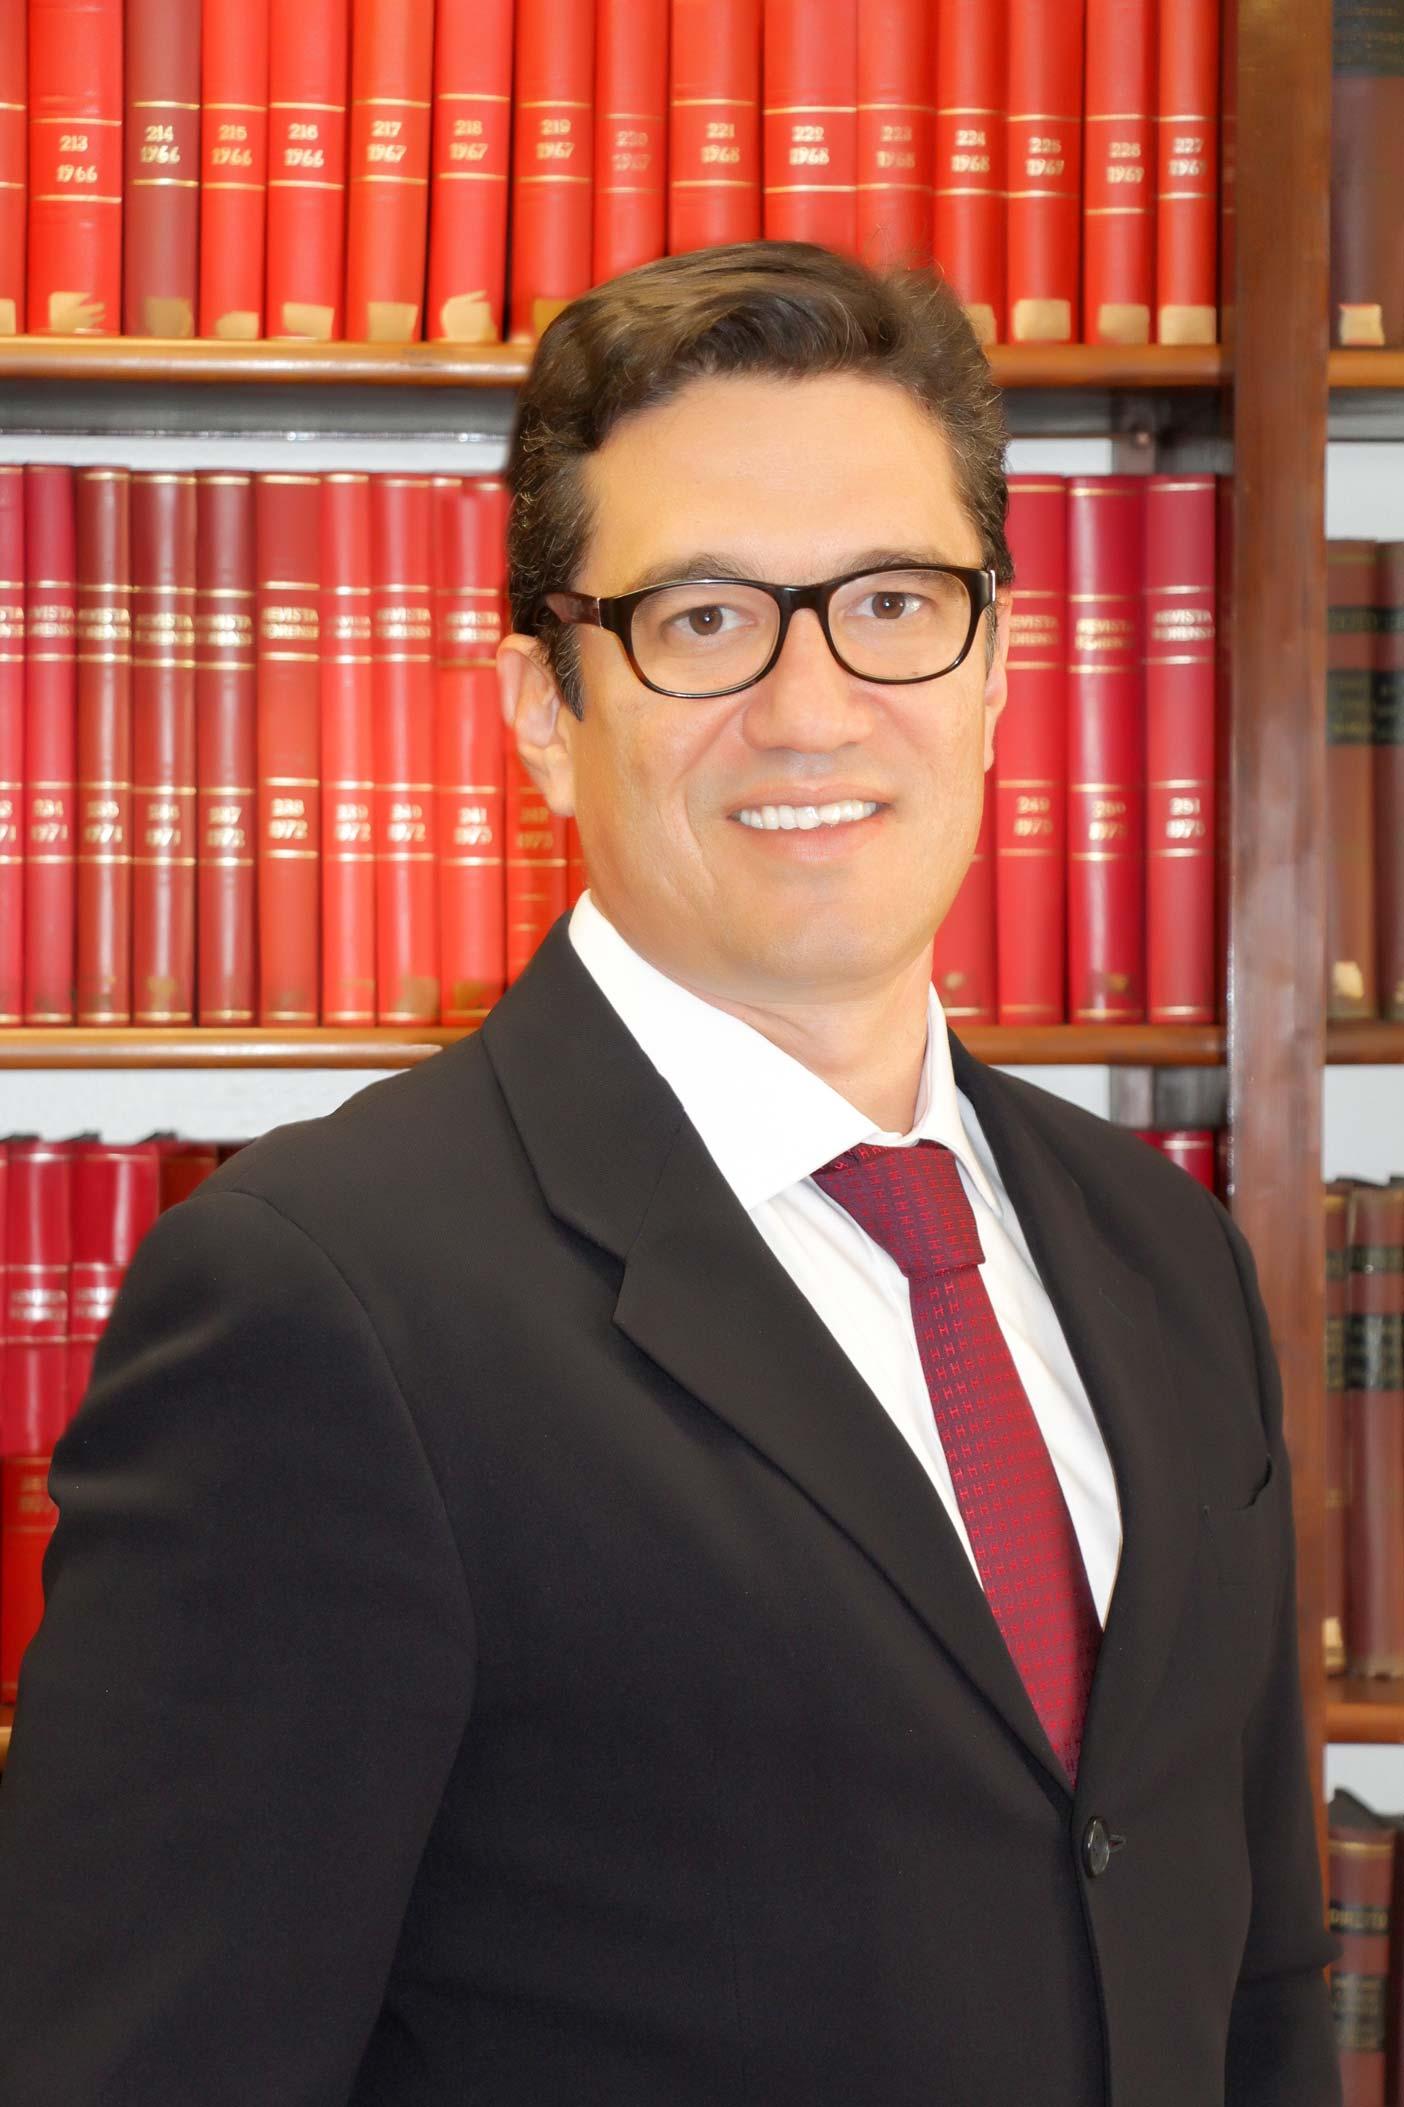 Frederico Diamantino